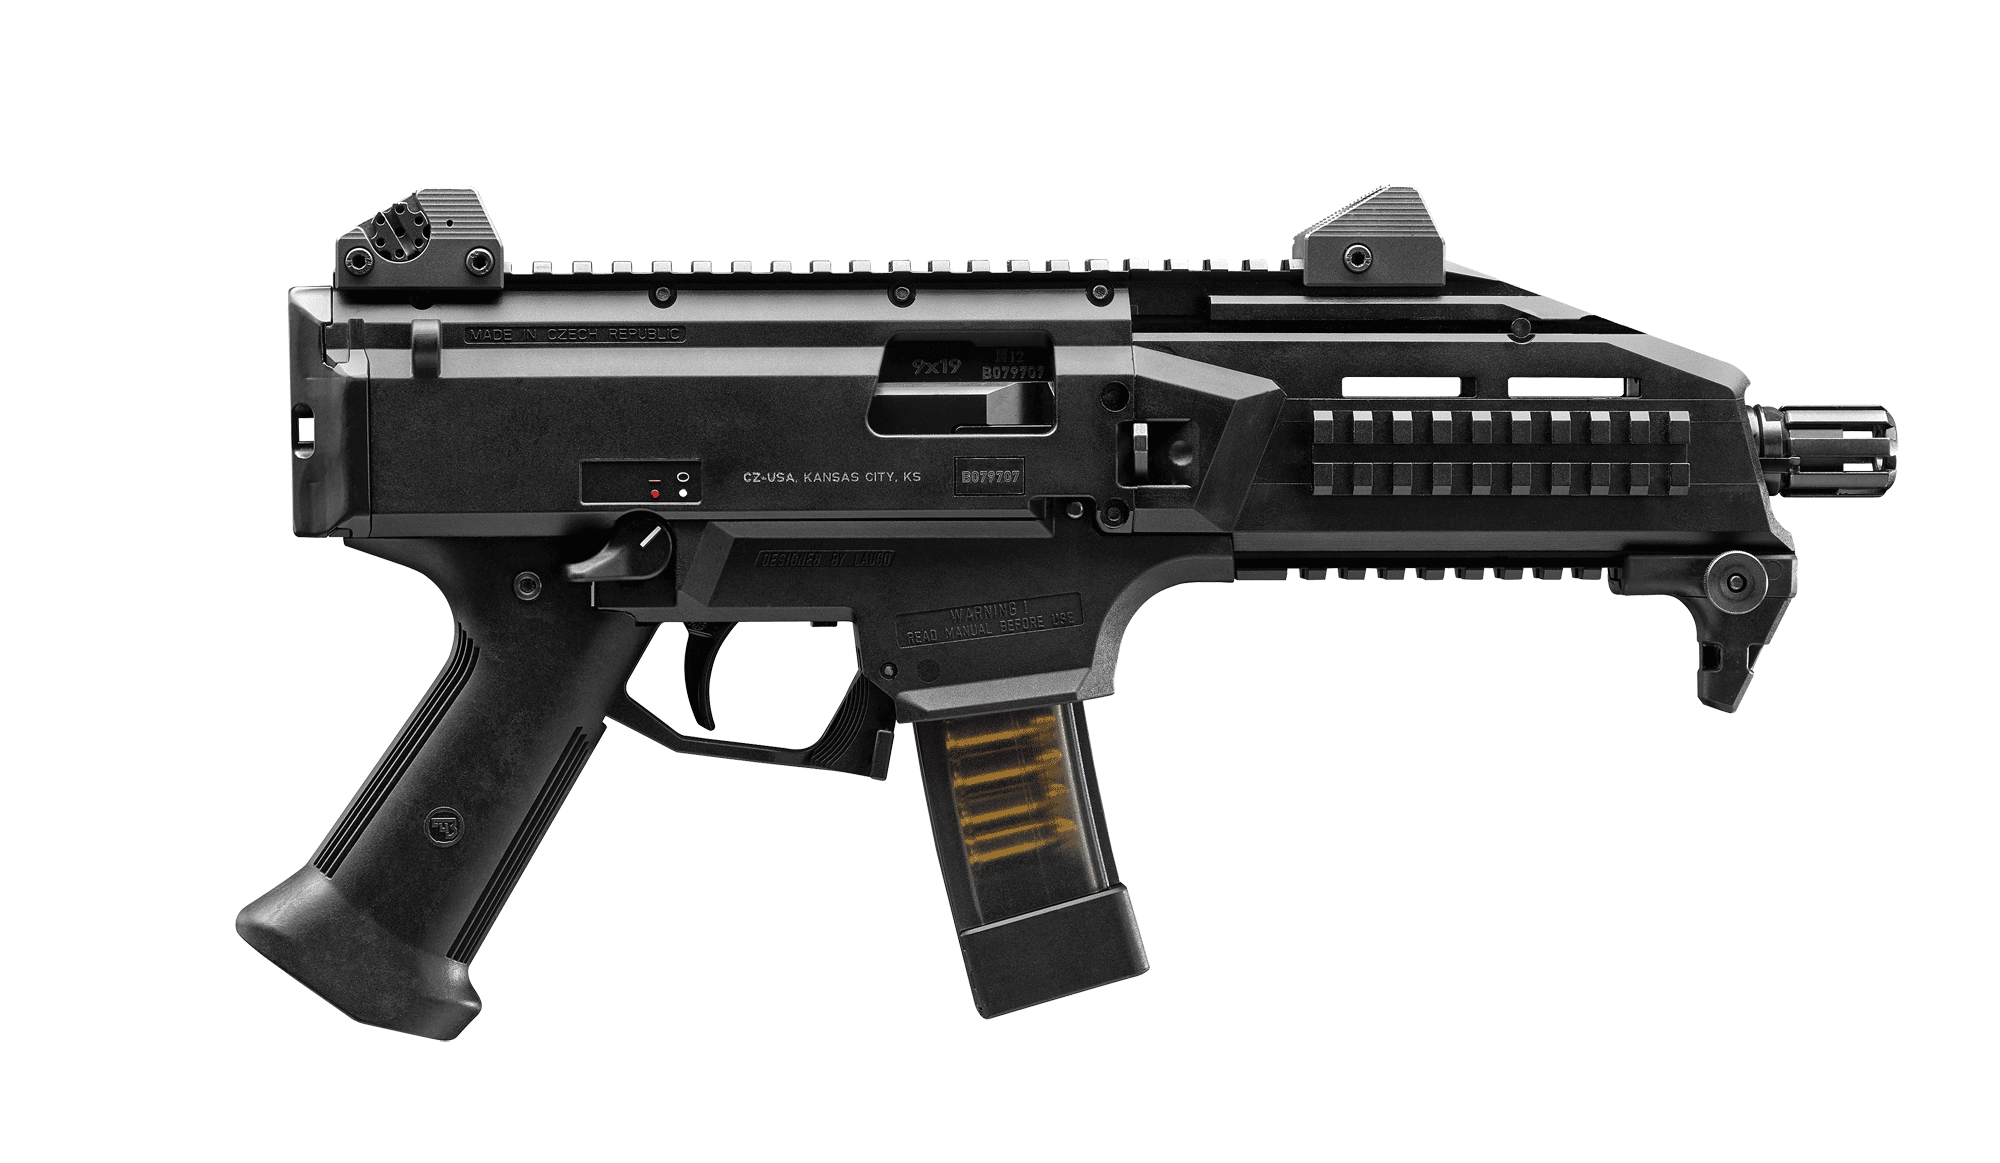 svg stock Vector carbine holographic sight. Cz usa scorpion evo